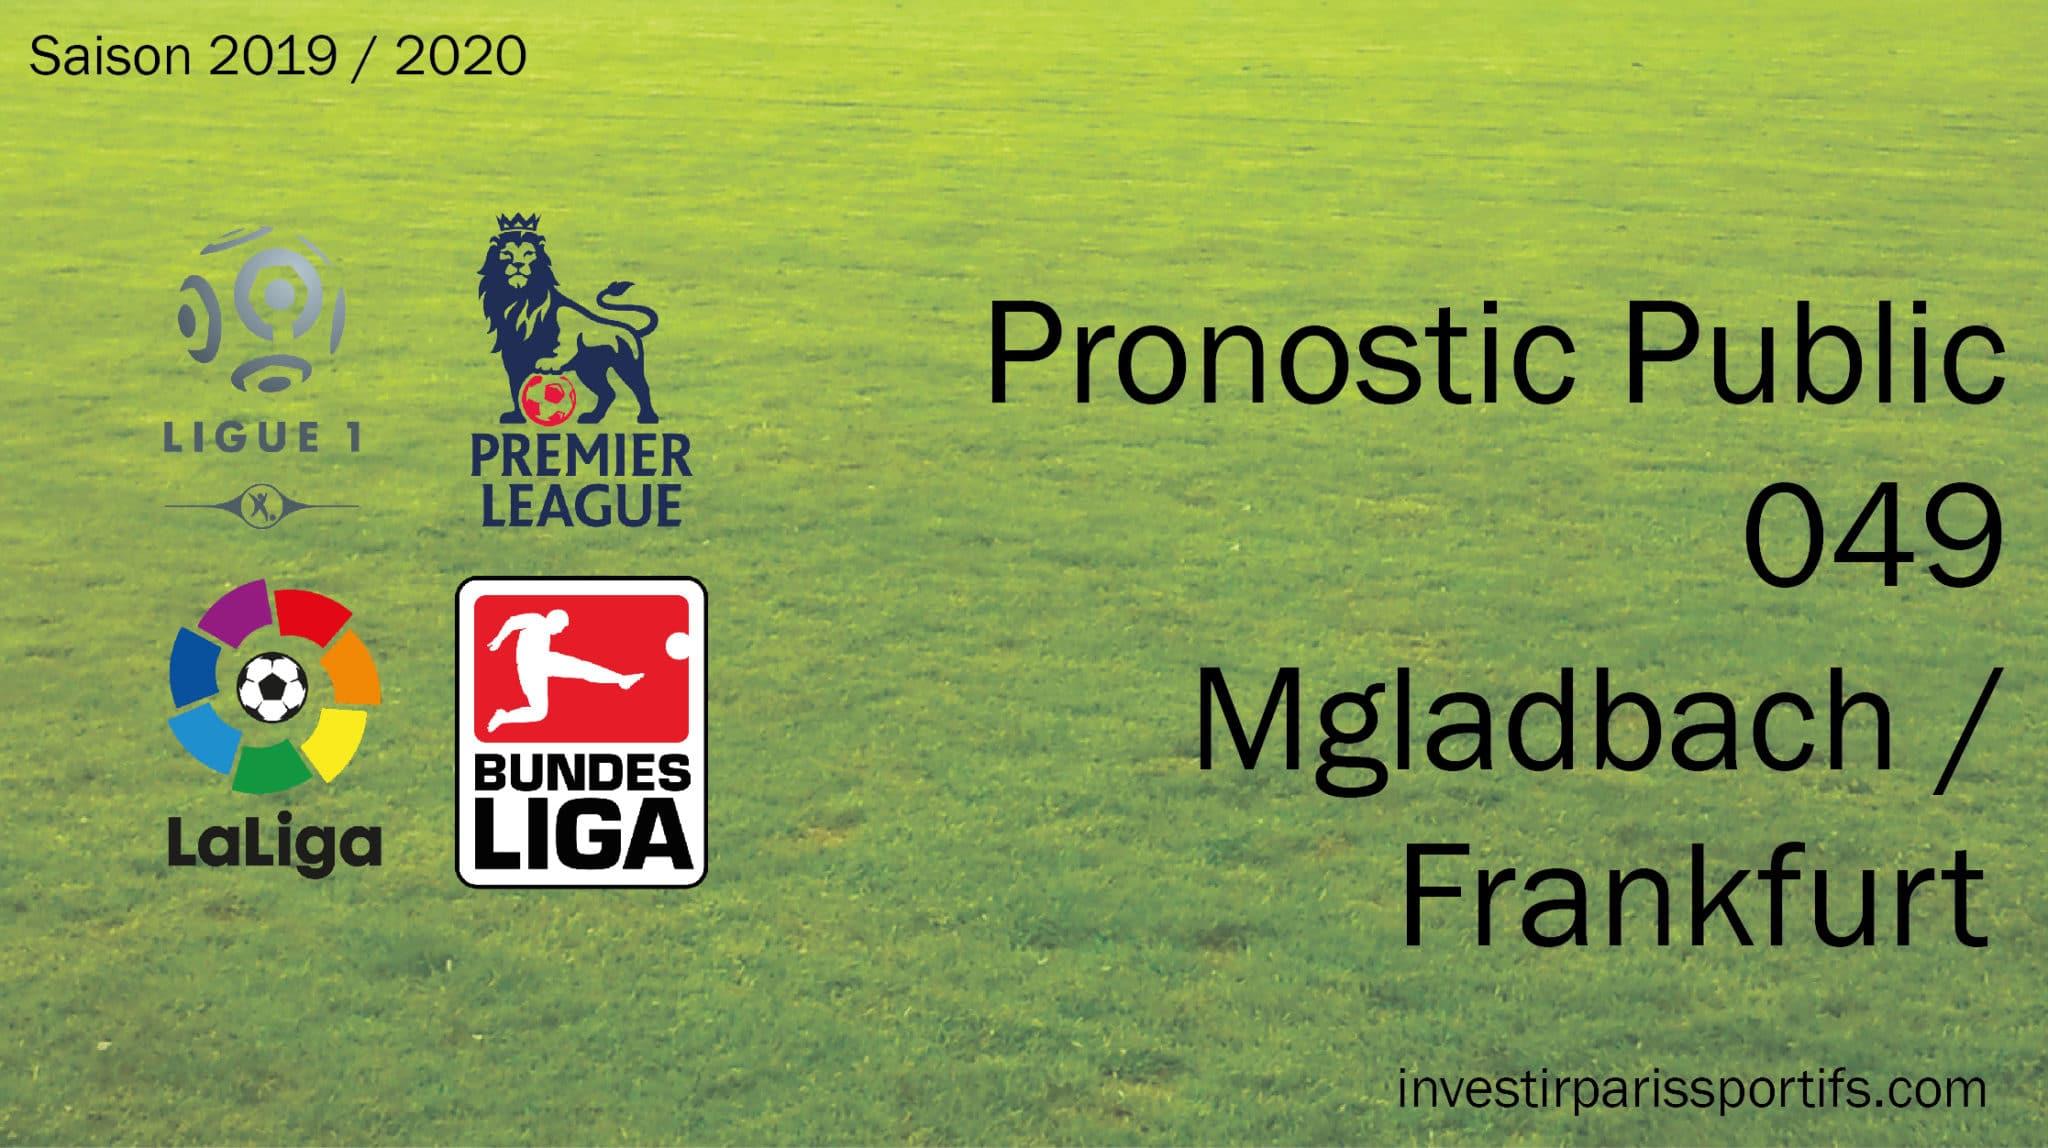 Pronostic 049 – Monchengladbach / Frankfurt – Bundesliga